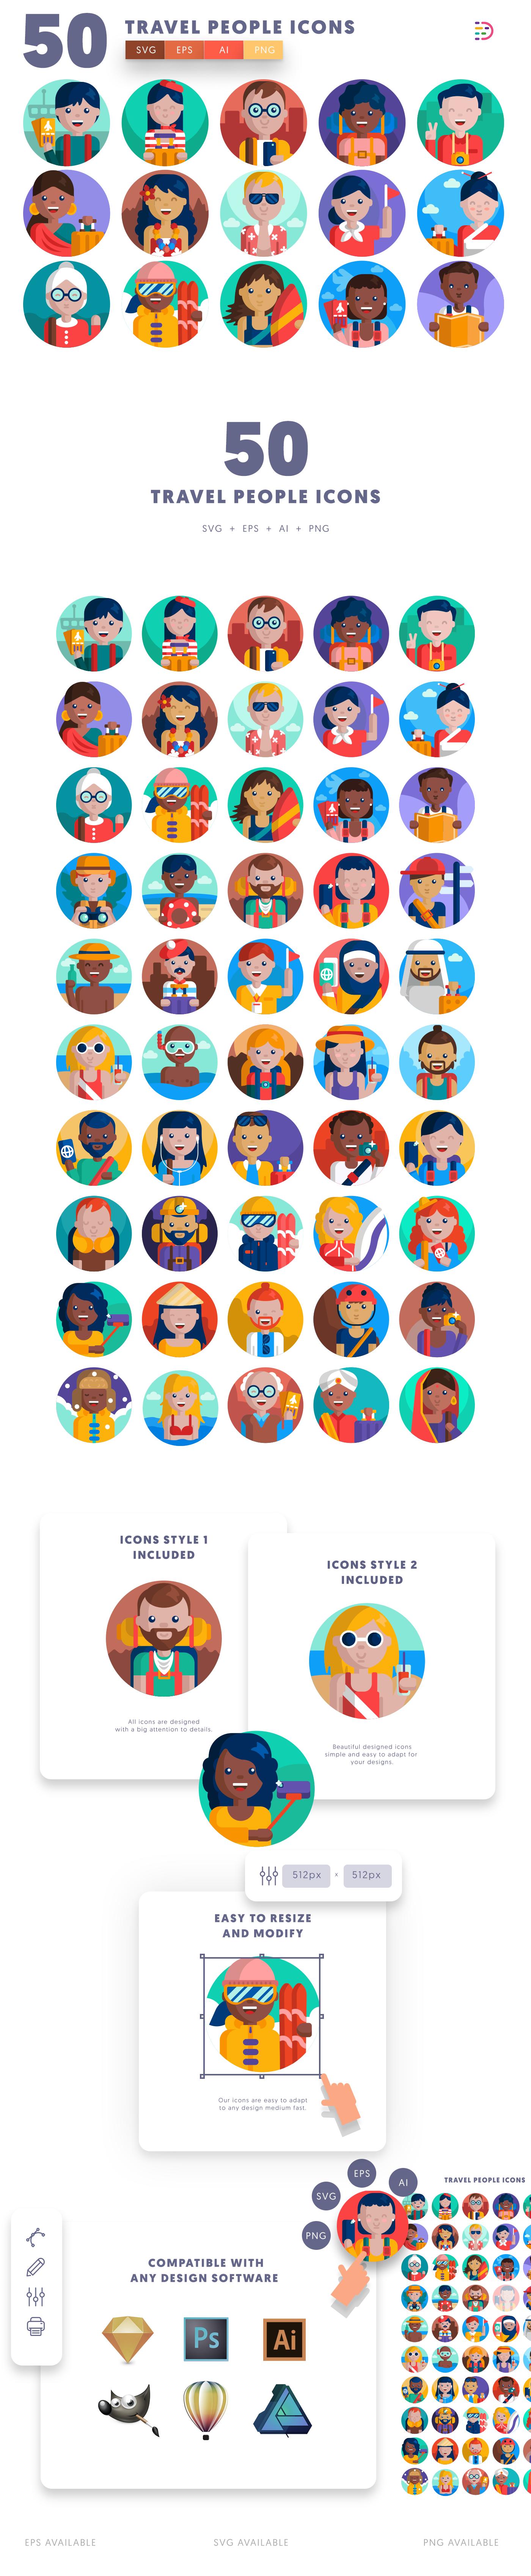 50 Travel People Icons list